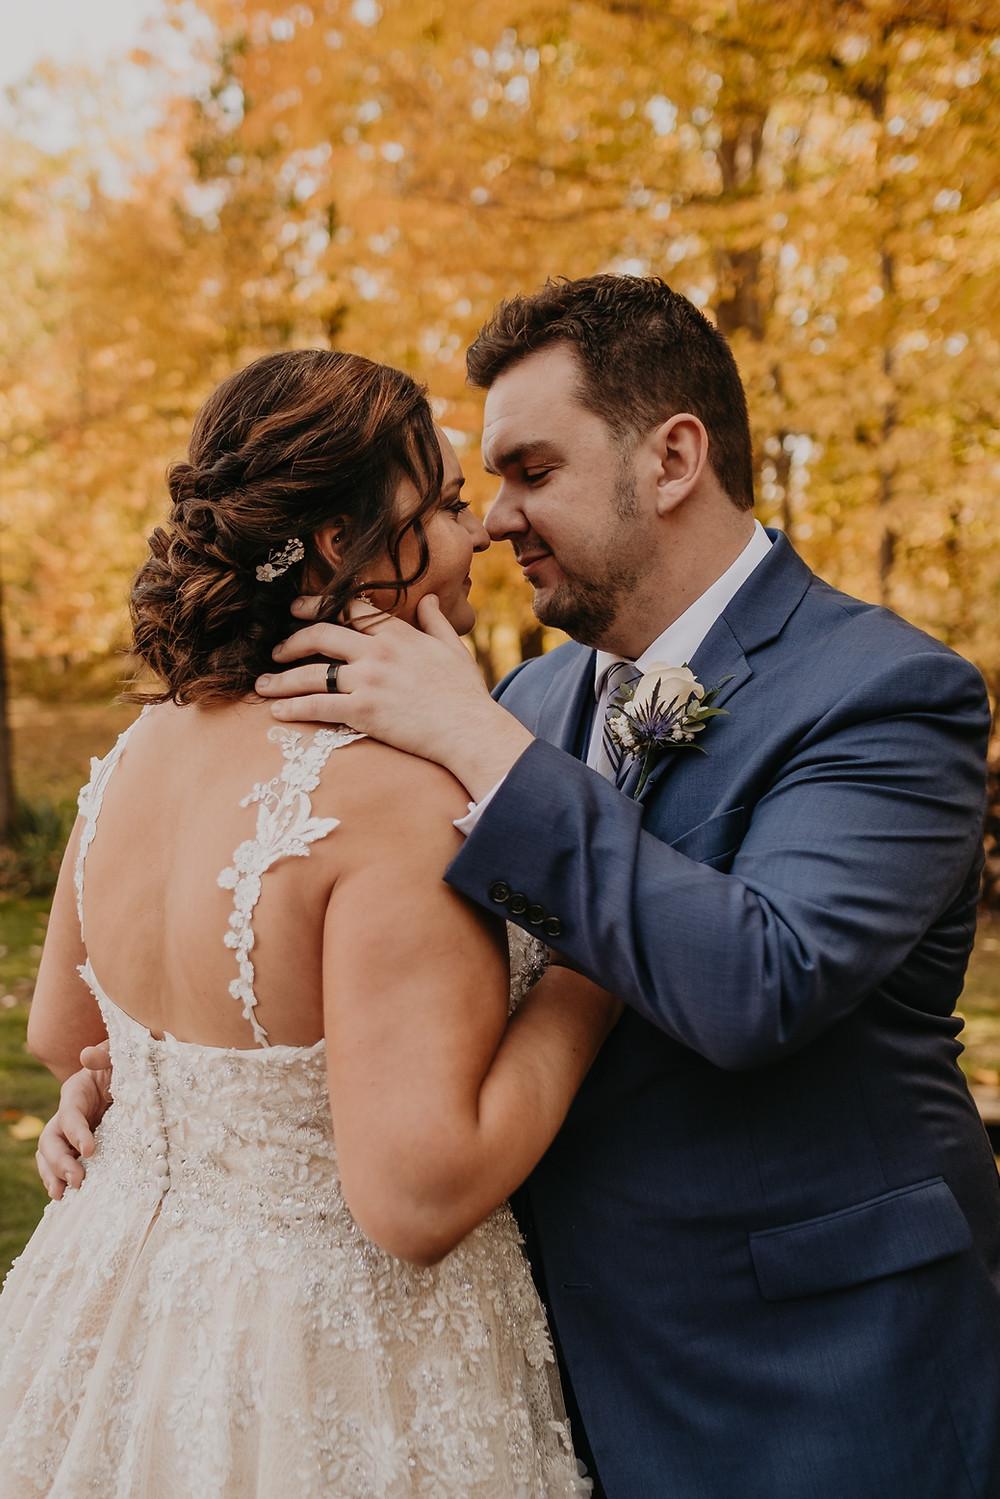 Metro Detroit couple wedding photos with fall colors